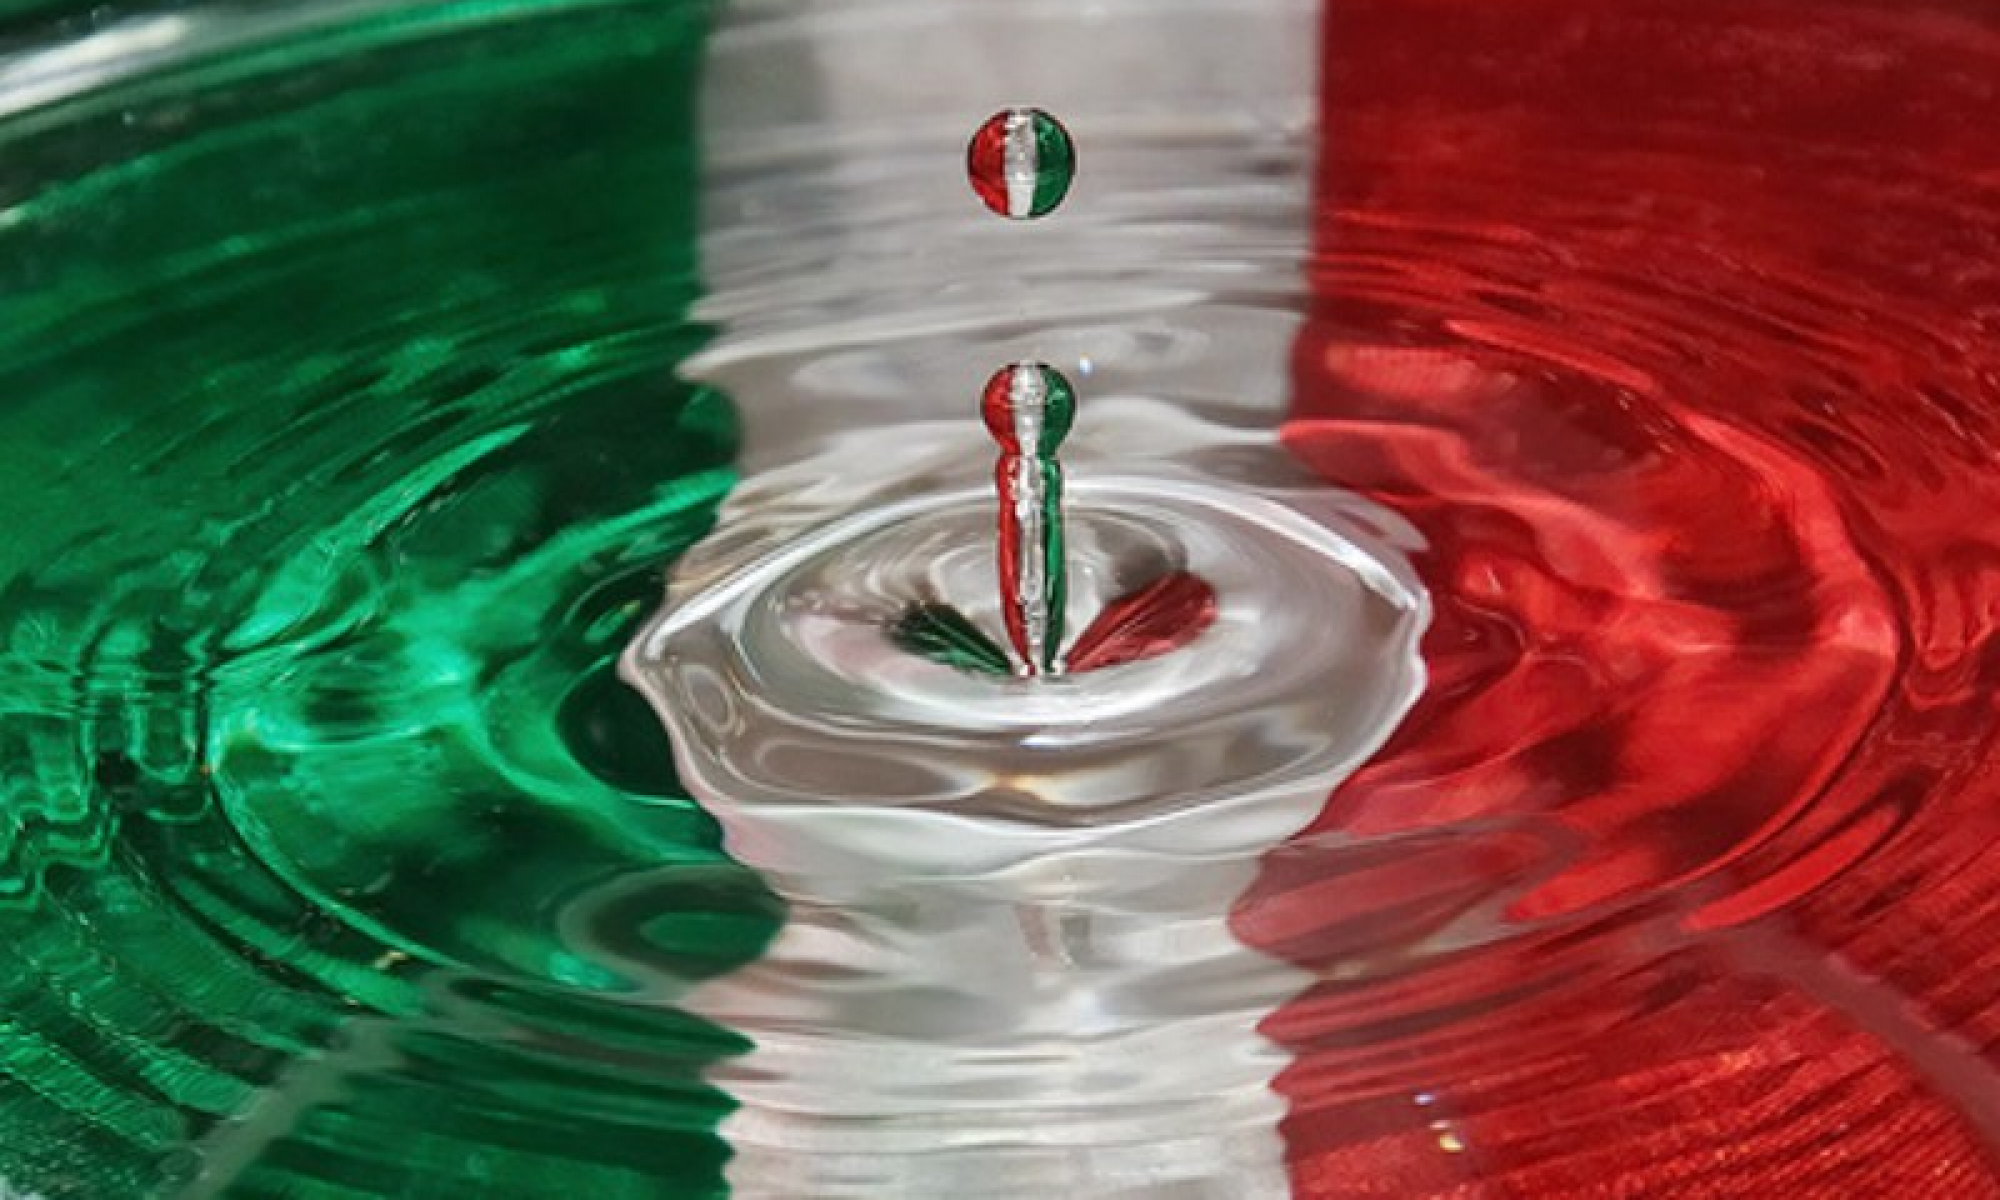 Tramites en Italia